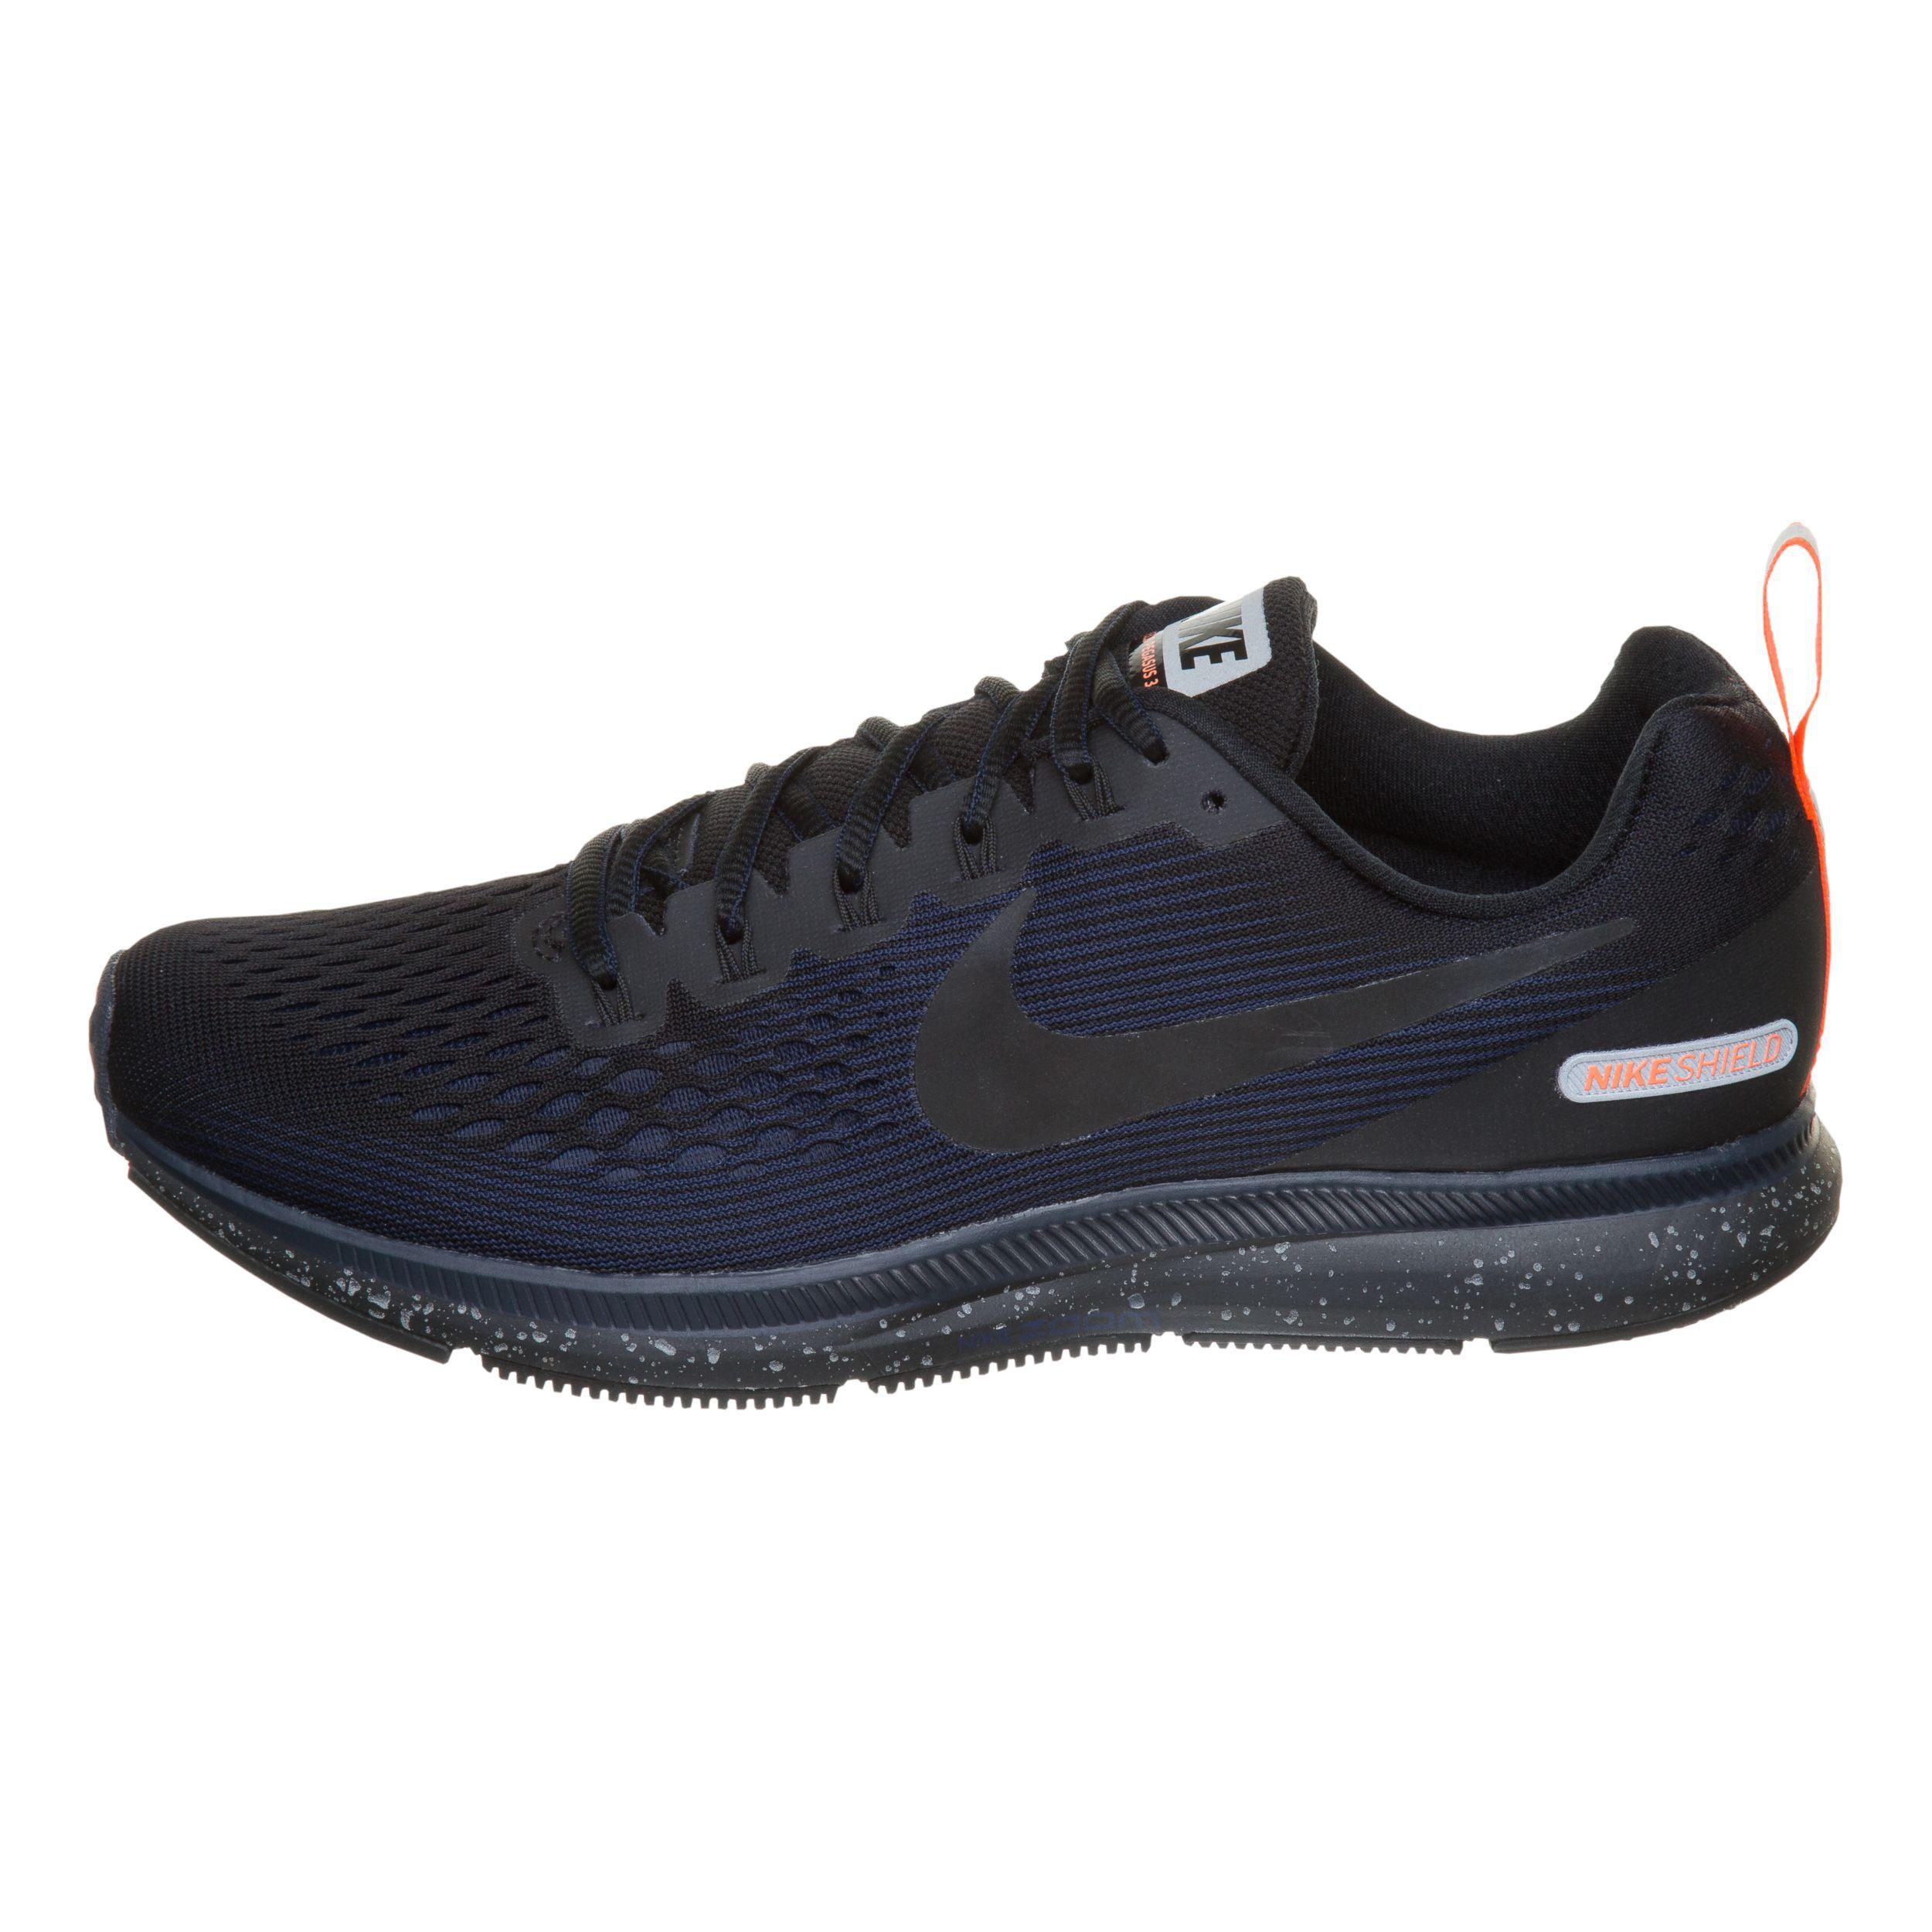 Schön Nike Air Zoom Pegasus 34 Shield Running Shoe Damen